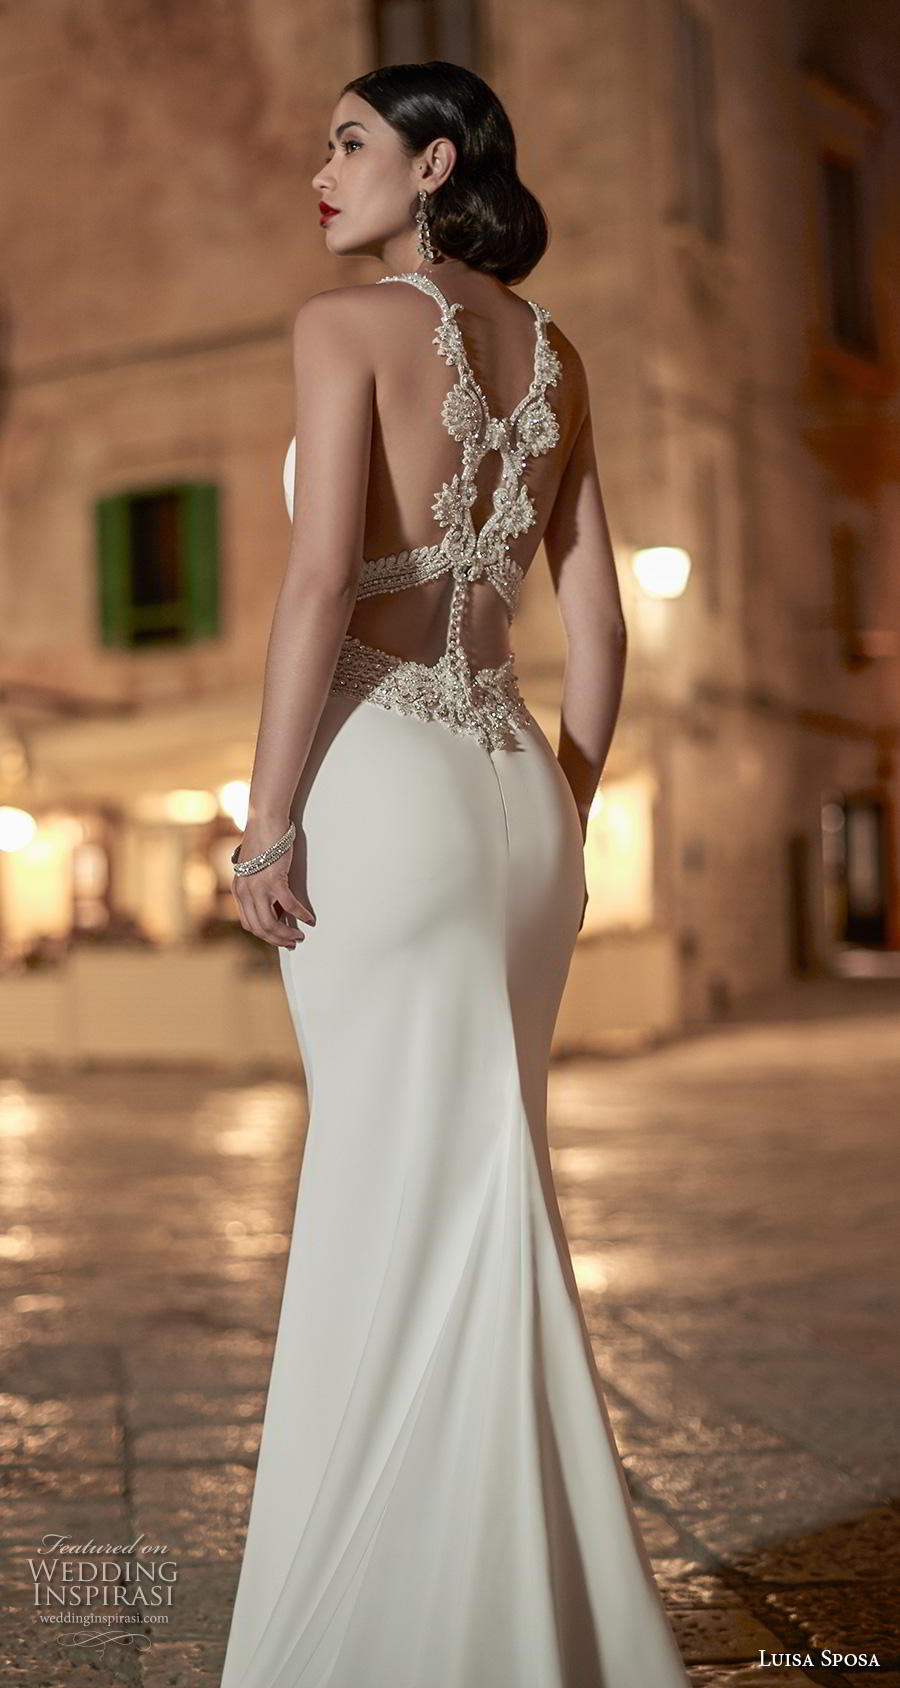 luisa sposa 2020 bridal sleeveless halter neck simple elegant glamorous fit and flare sheath wedding dress strap back chapel train (6) bv